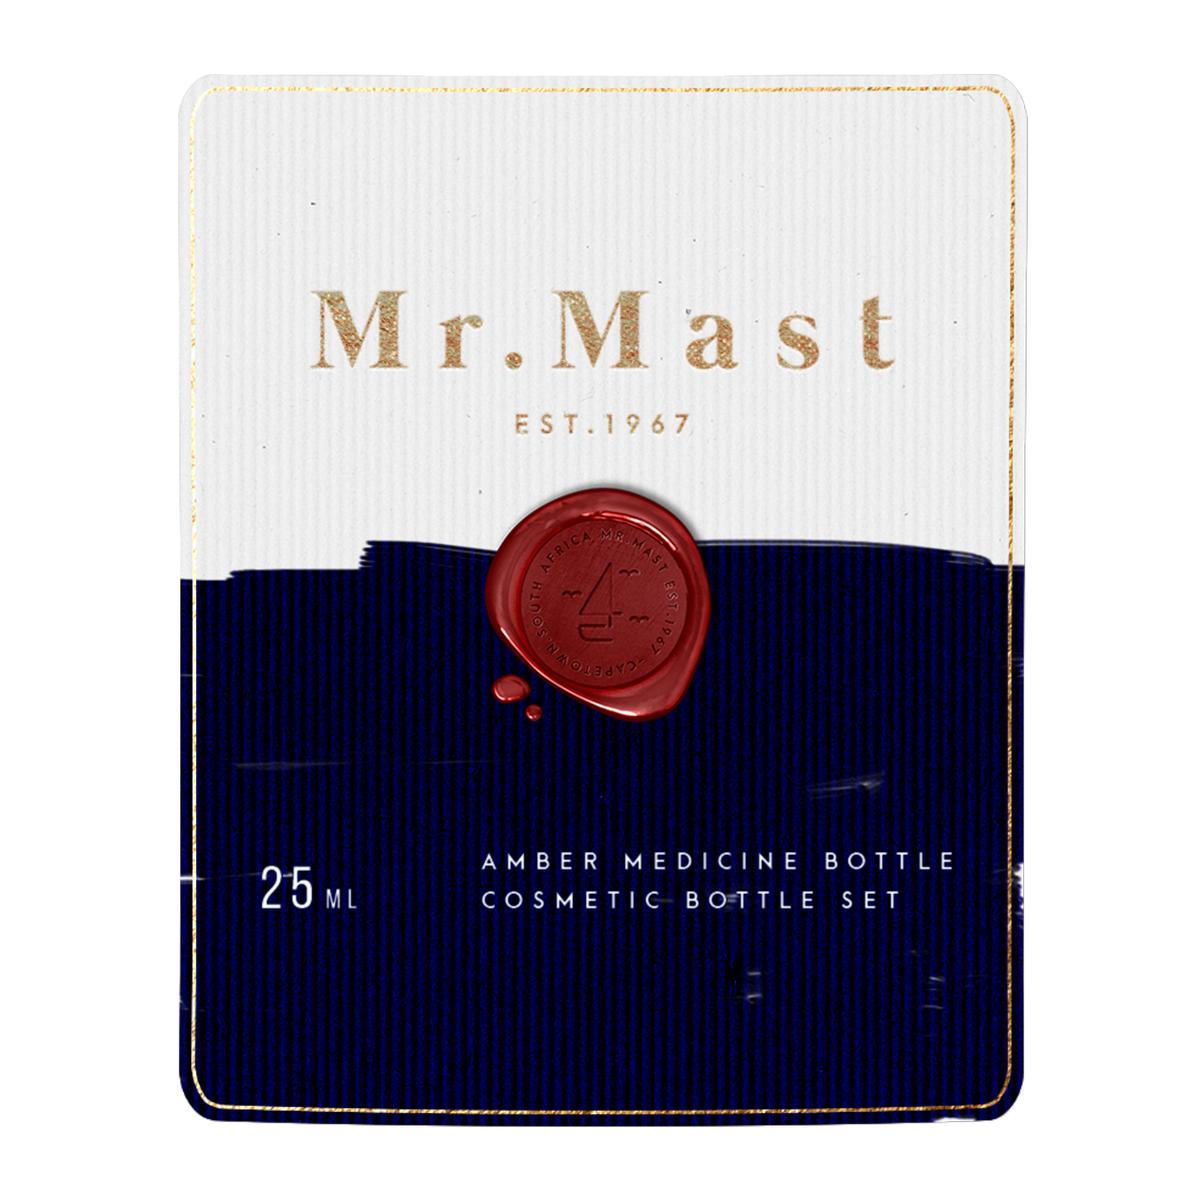 mast_label.jpg